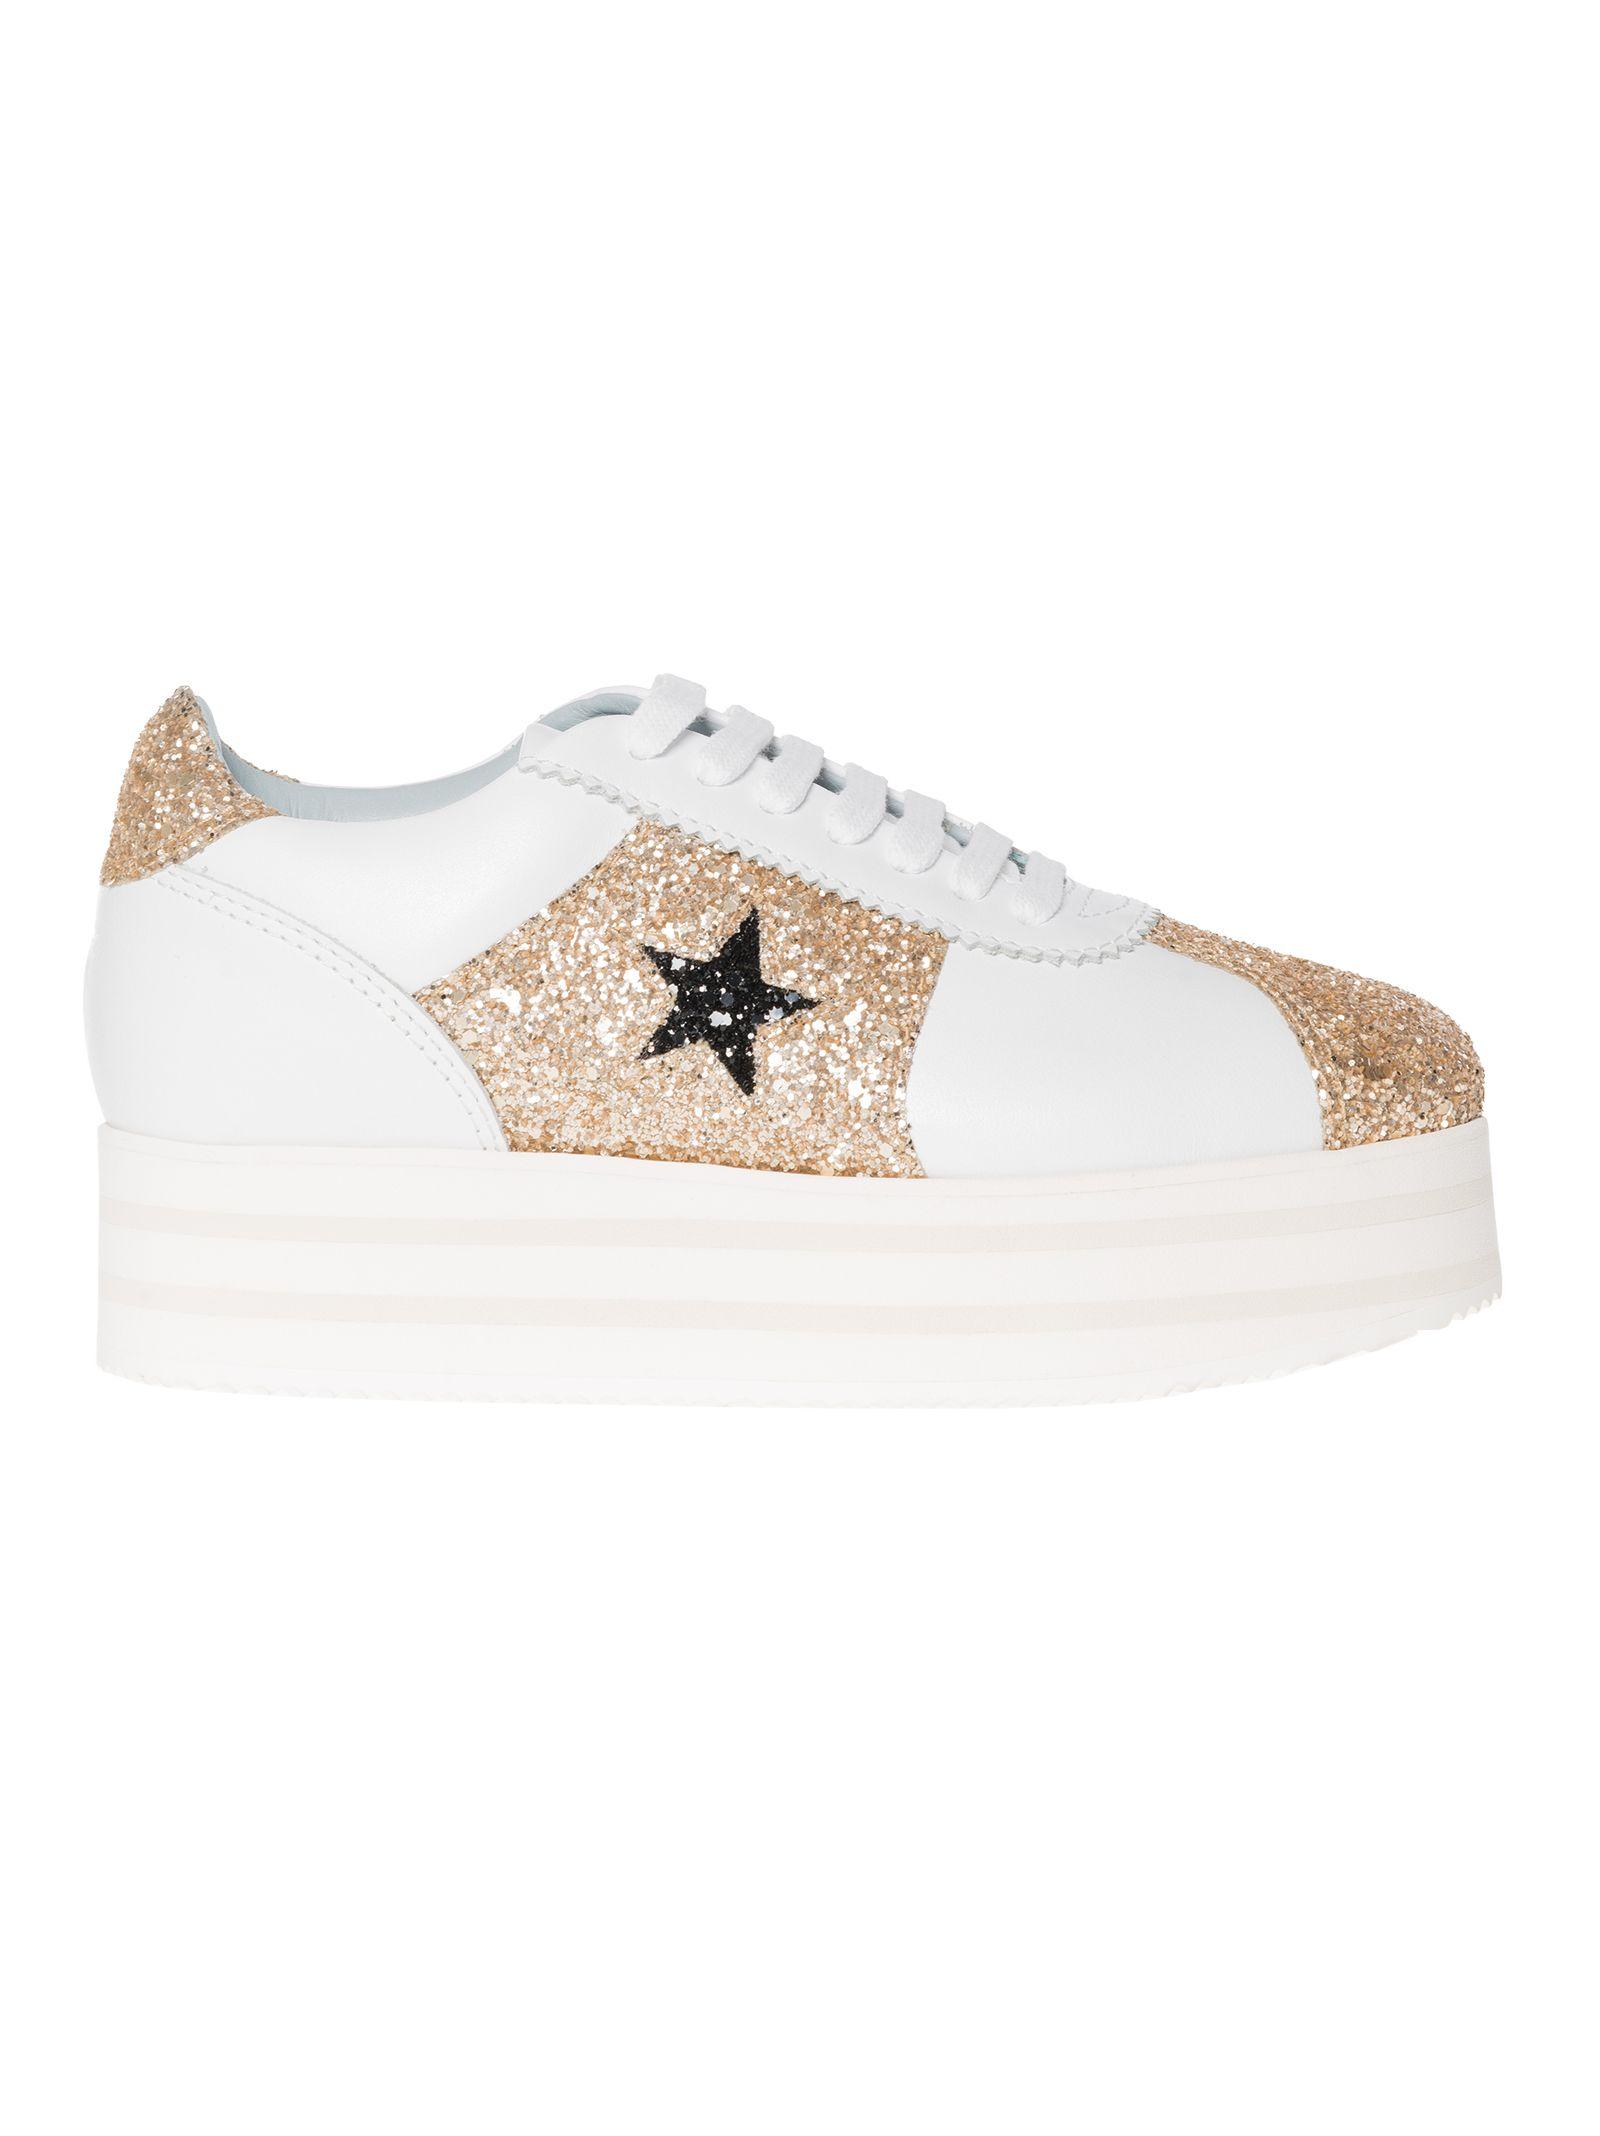 Chiara Ferragni contrast star sneakers clearance low shipping fee OyiC87